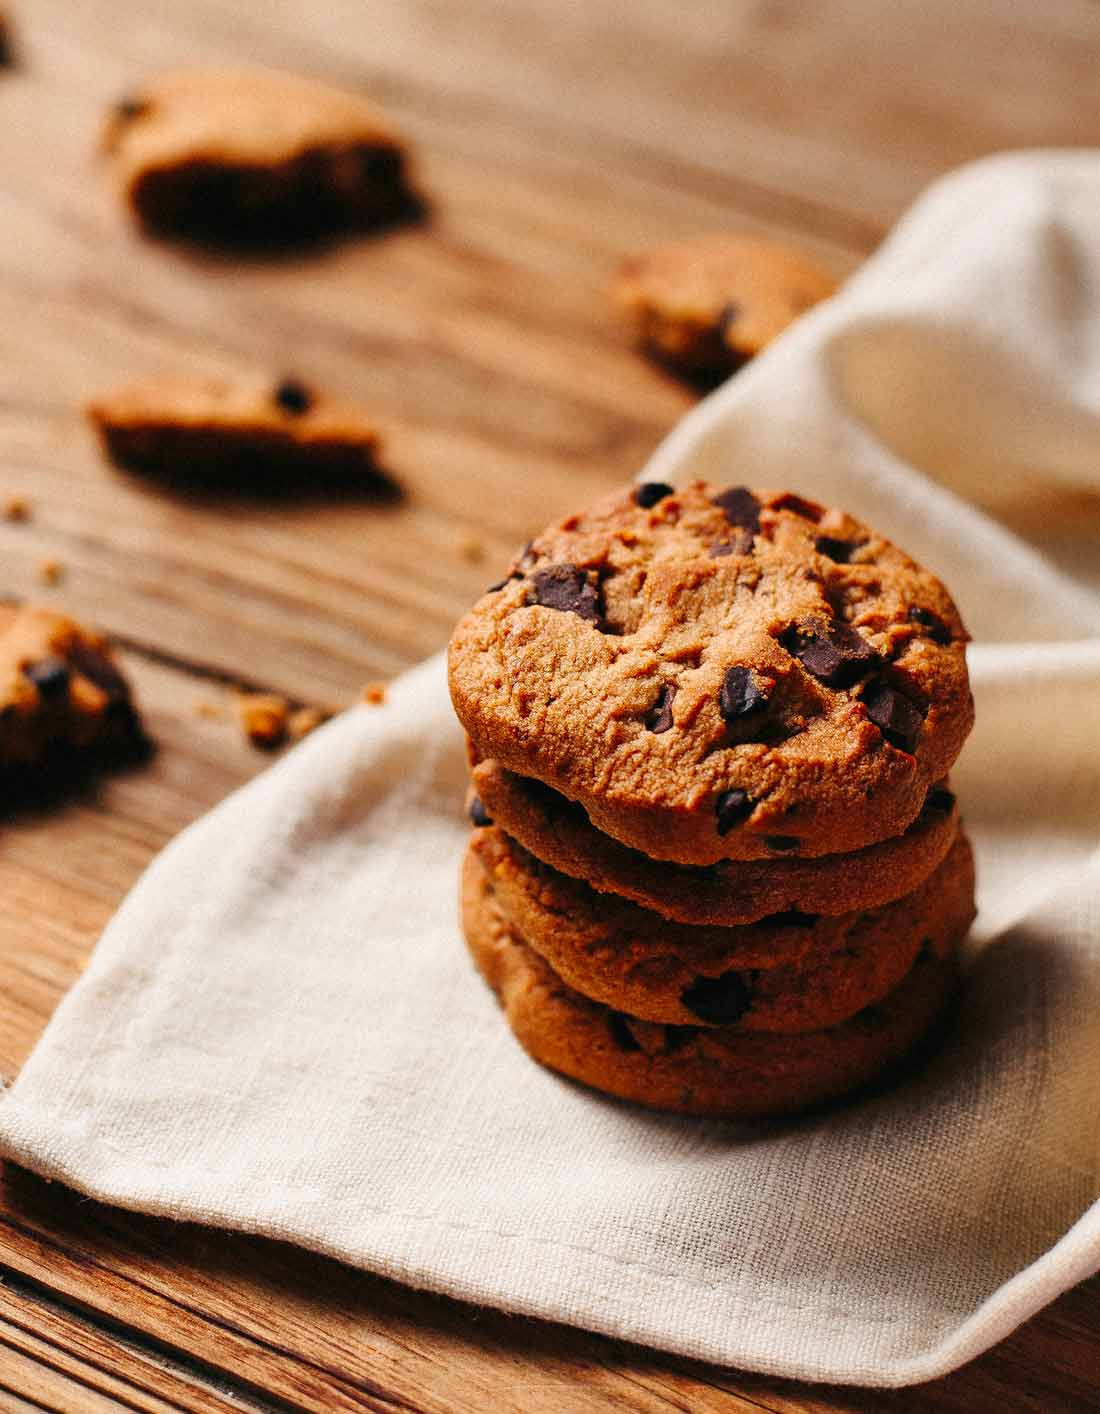 cookies thermomix pour 8 personnes recettes elle table. Black Bedroom Furniture Sets. Home Design Ideas